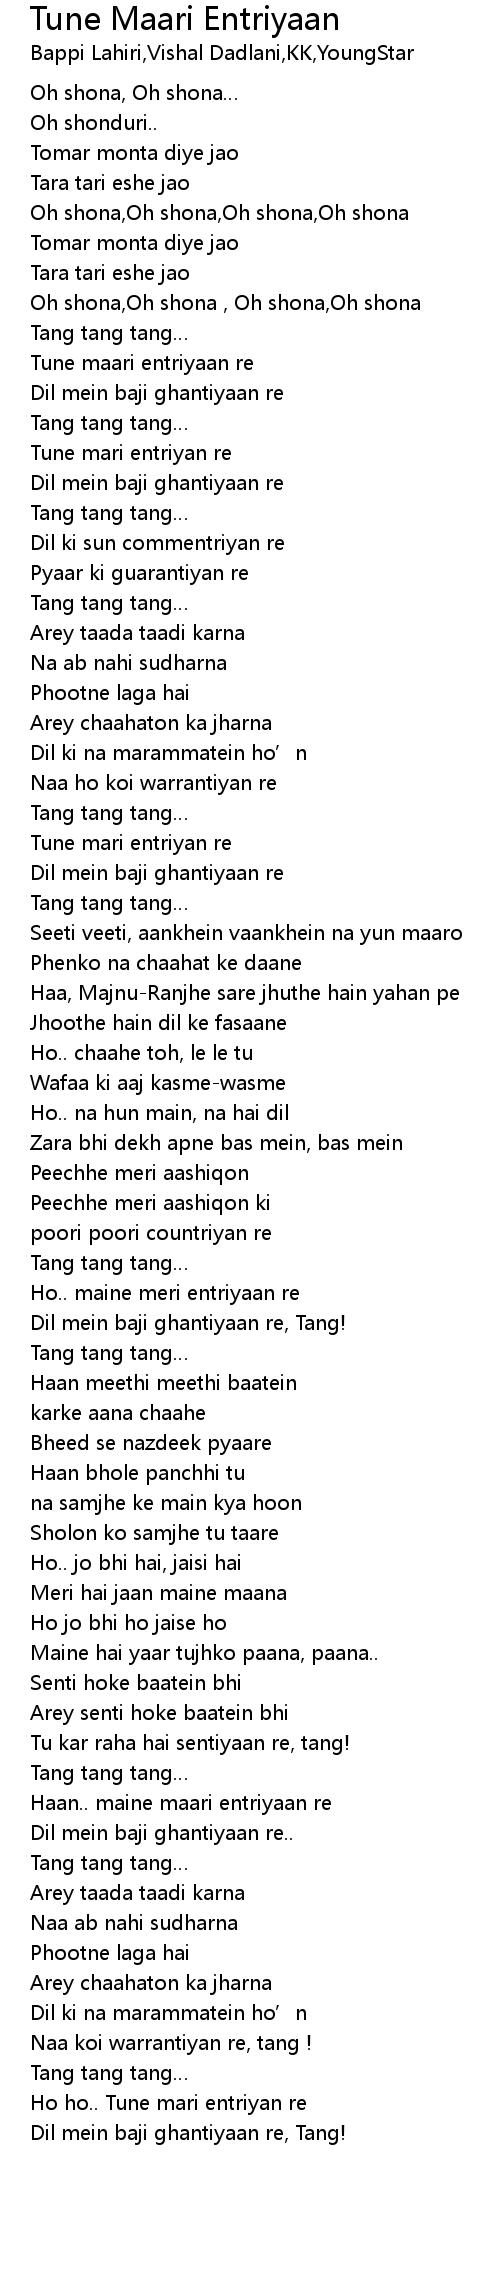 Tune Maari Entriyaan Lyrics Follow Lyrics